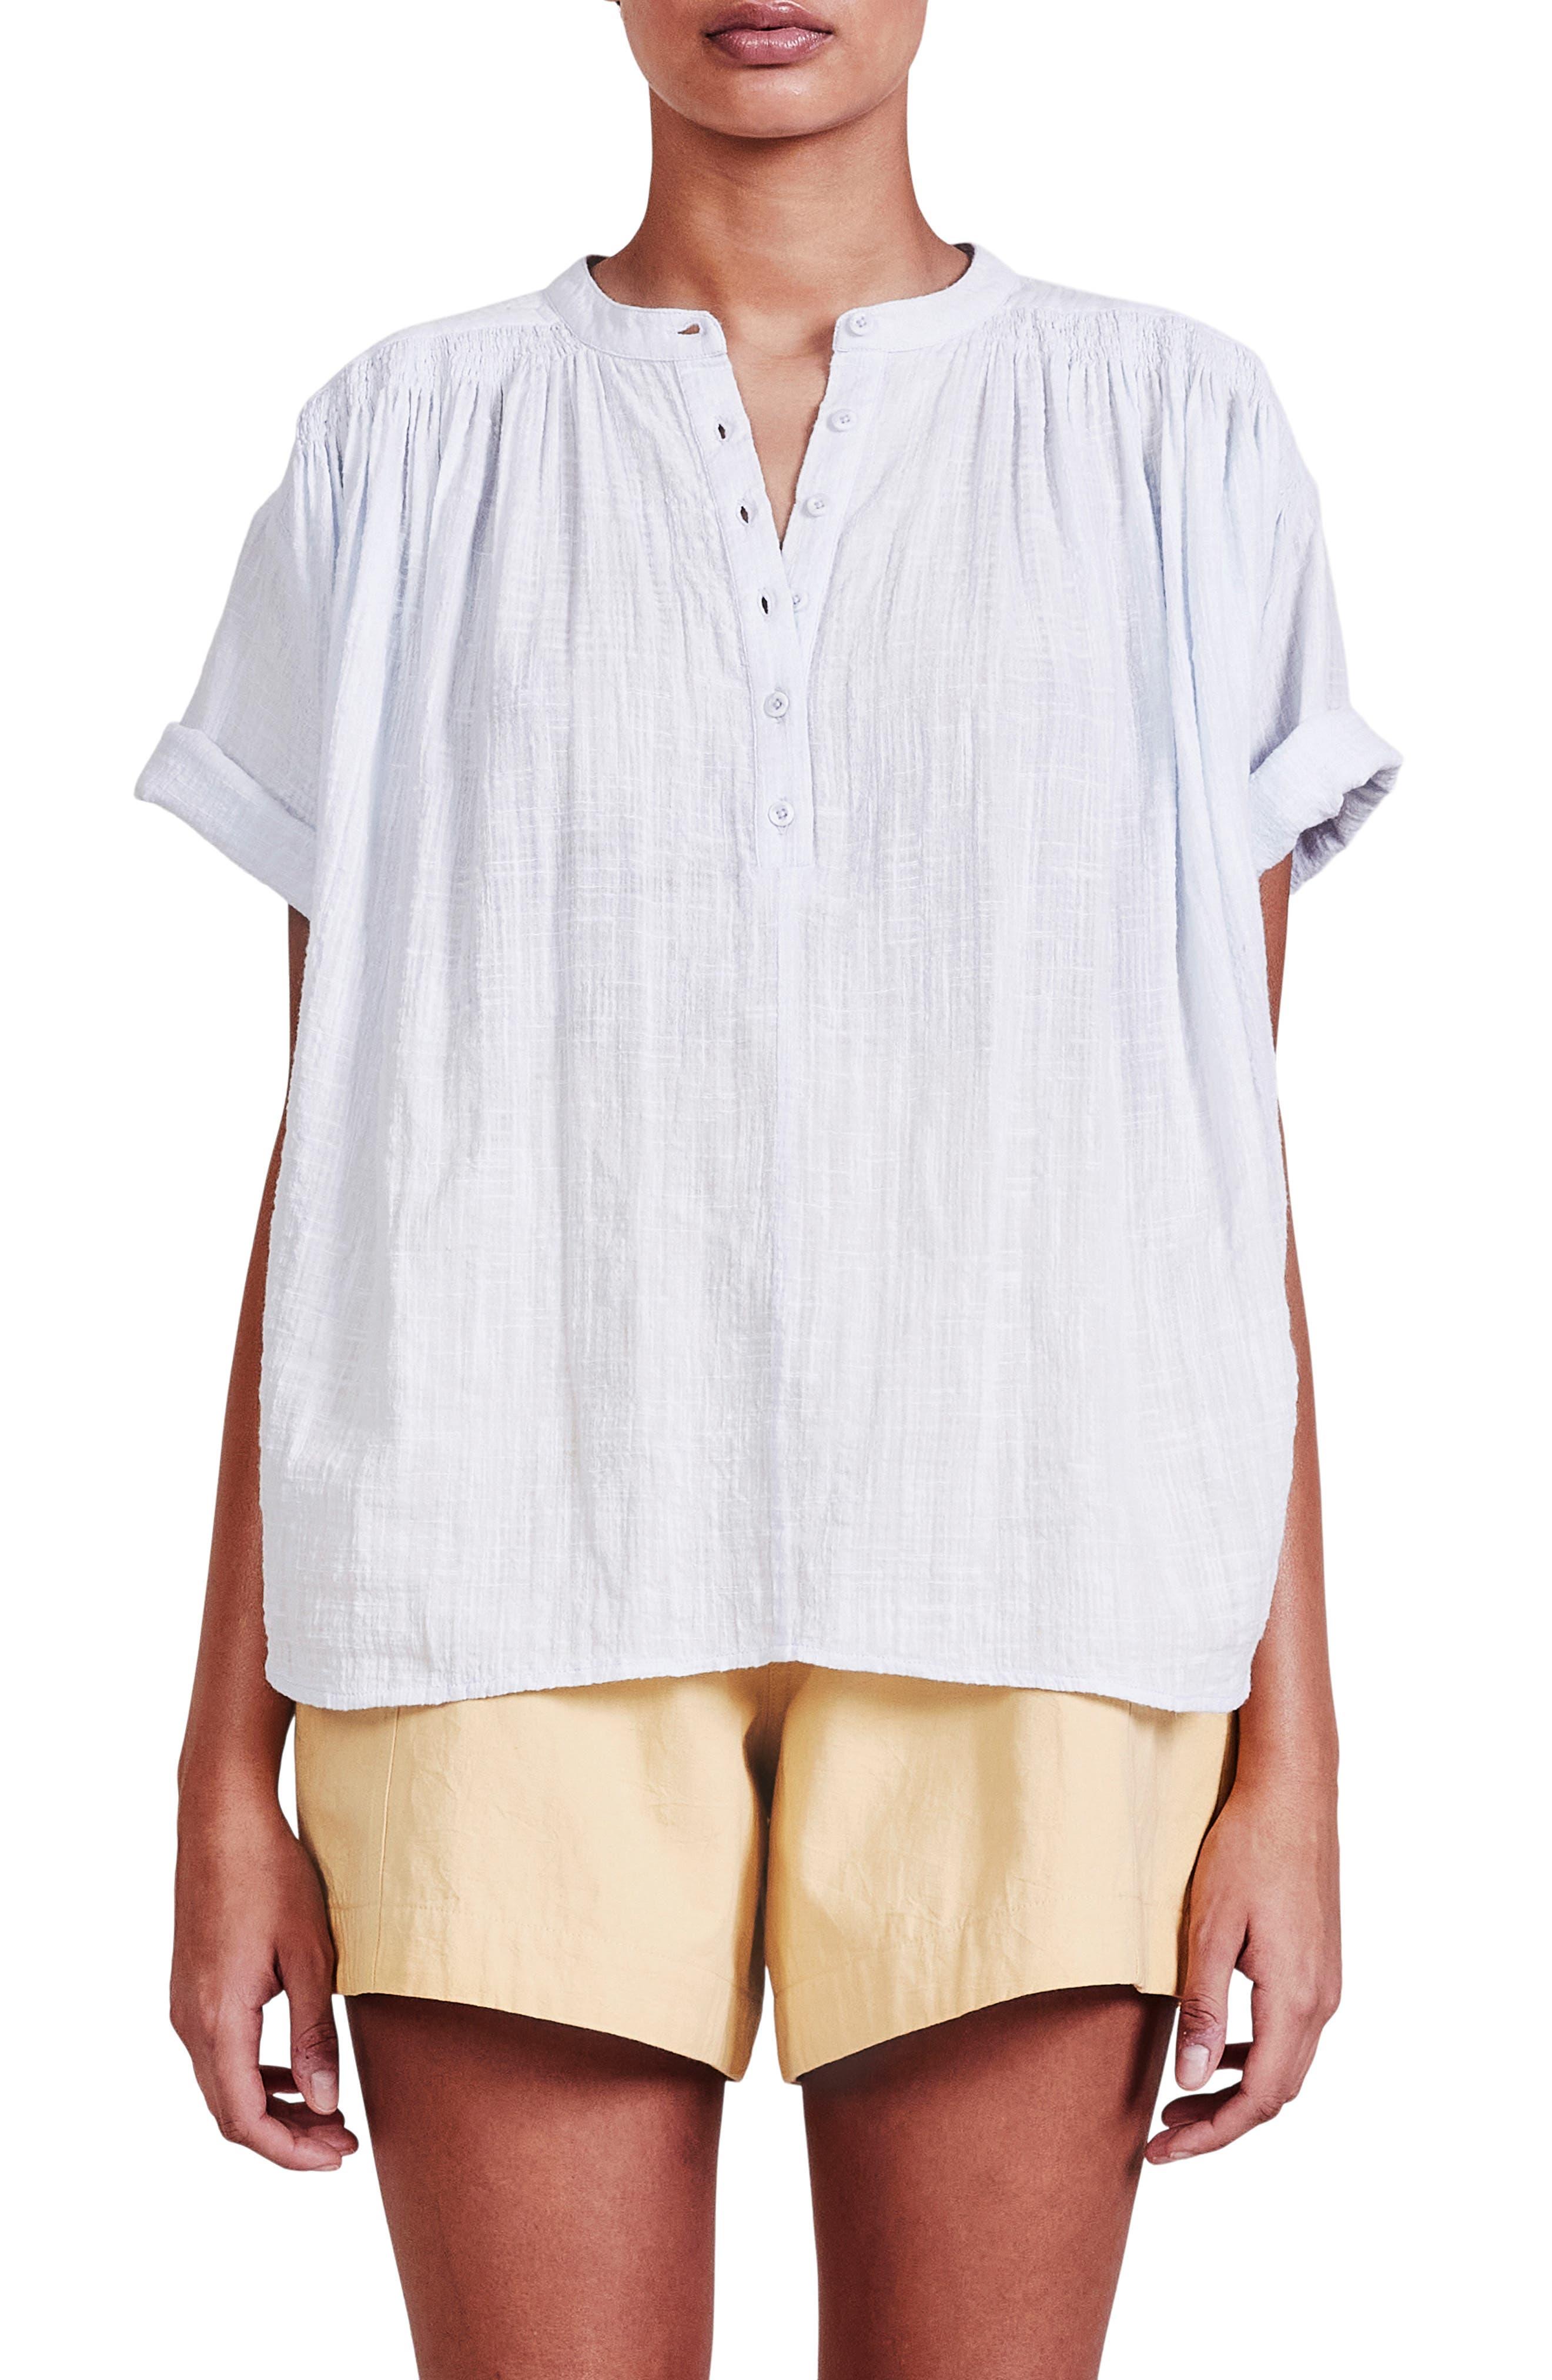 Mission Organic Cotton Shirred Top